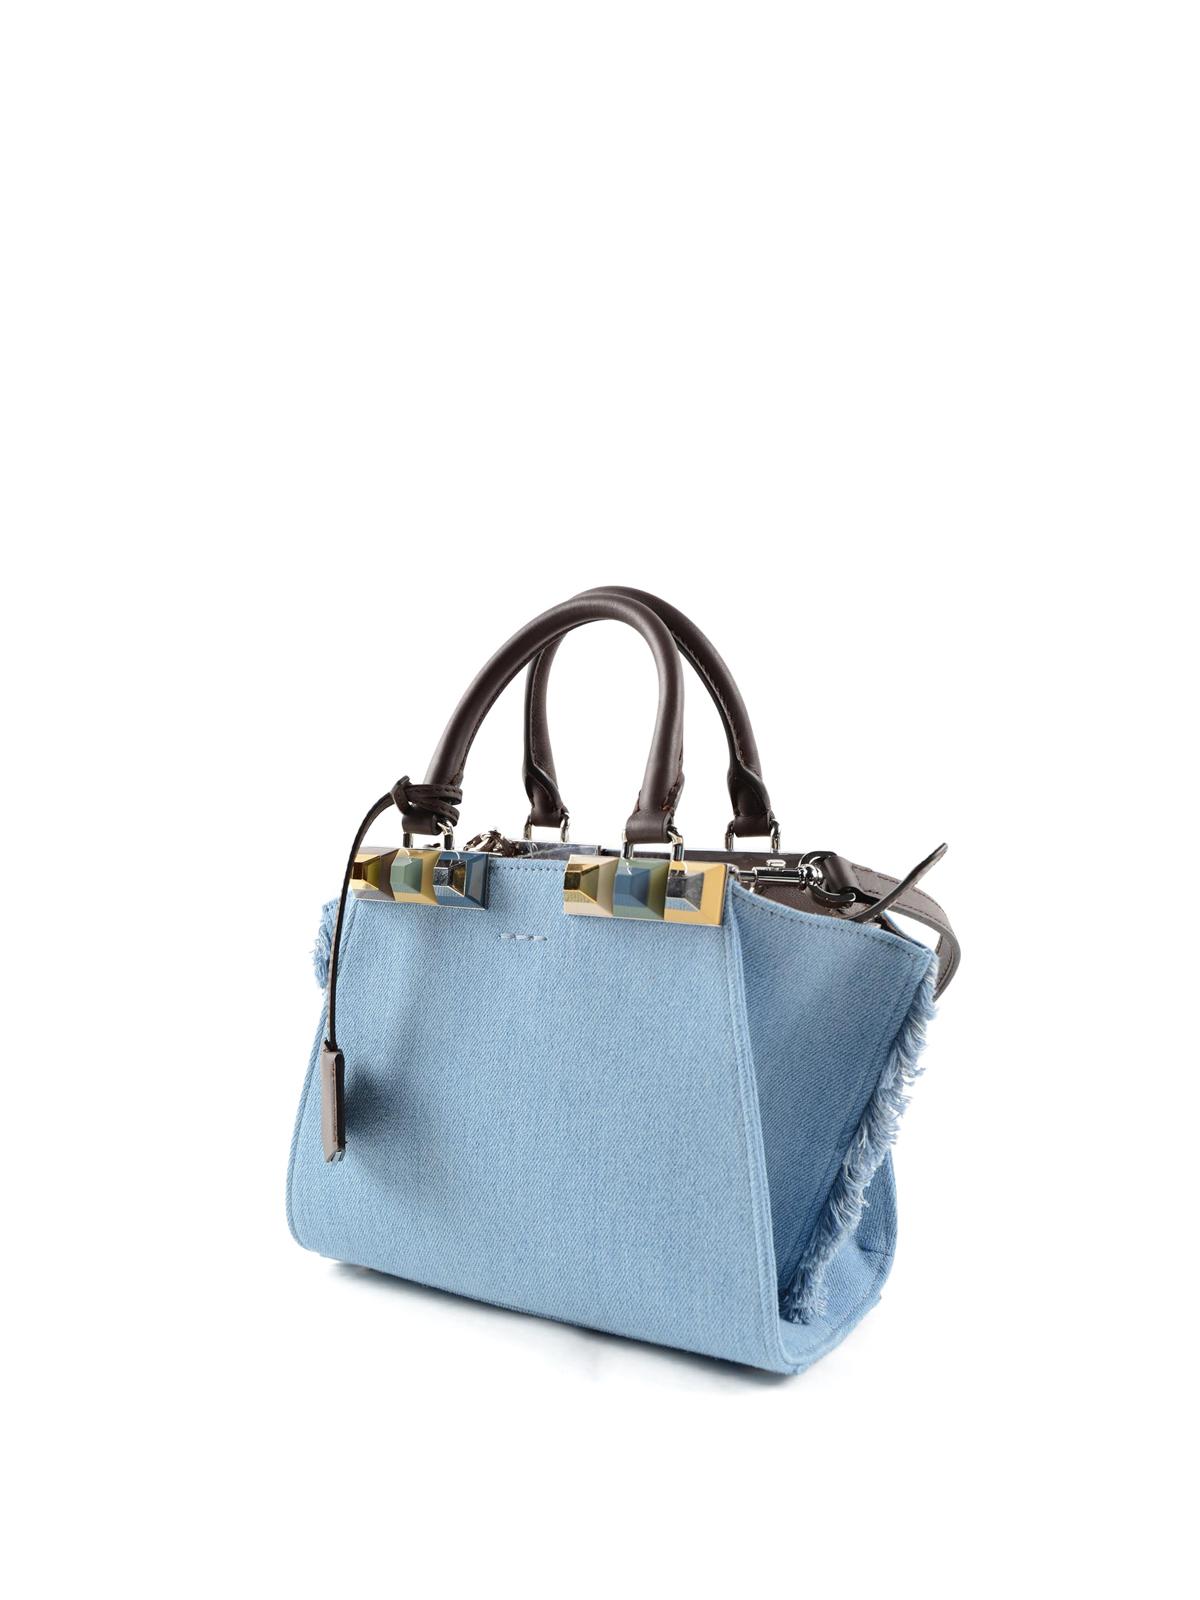 676d43f0a3 Fendi - Mini 3 Jours denim bag - bowling bags - 8BH333SVH7HC